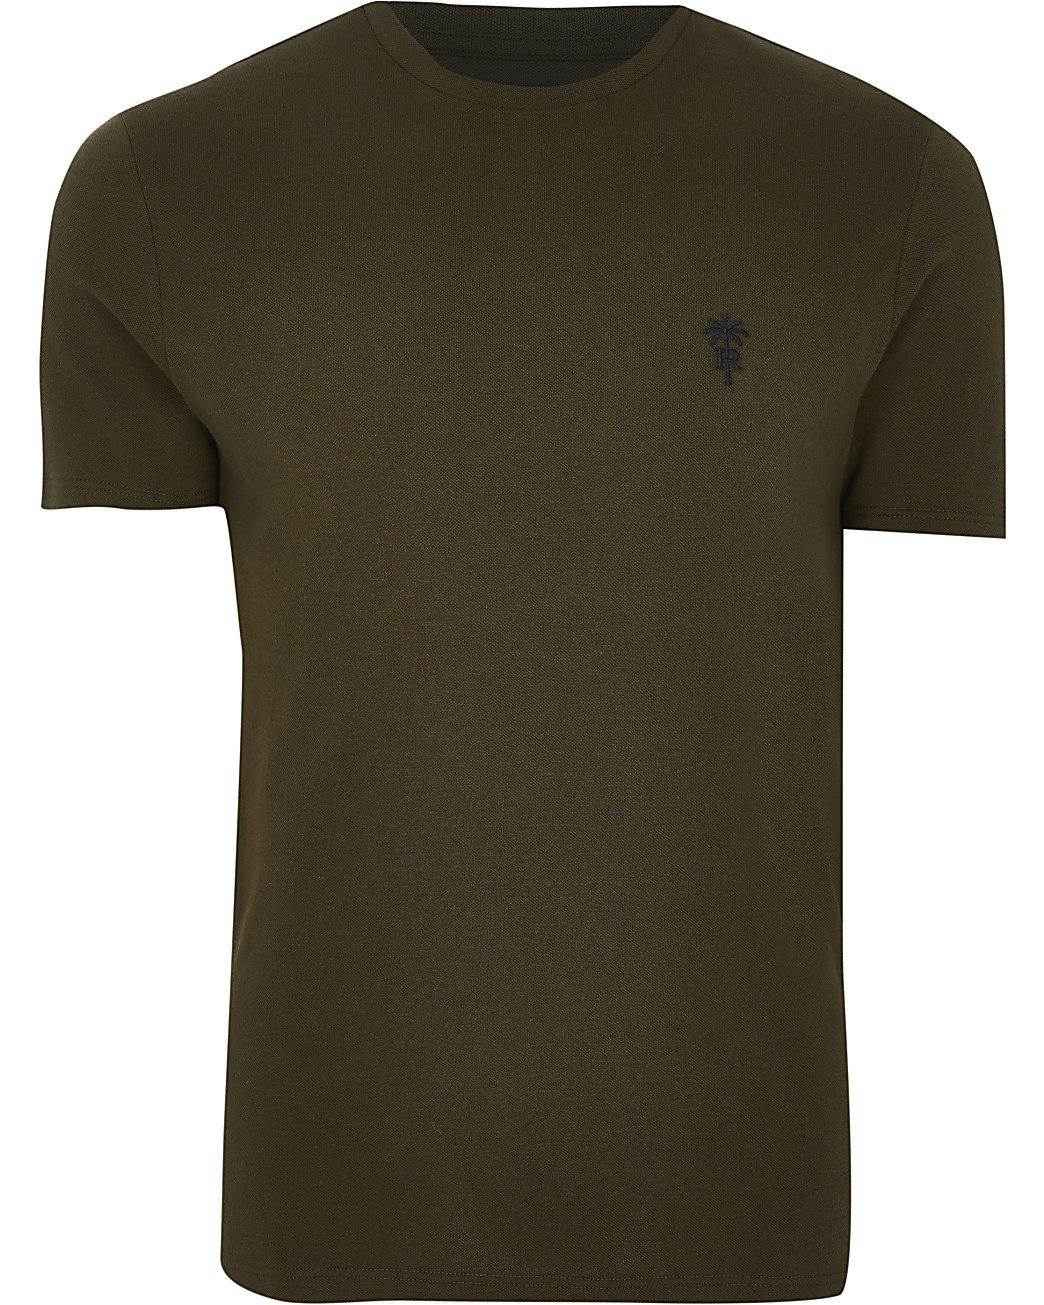 Khaki 'RR' palm trees logo slim fit t-shirt